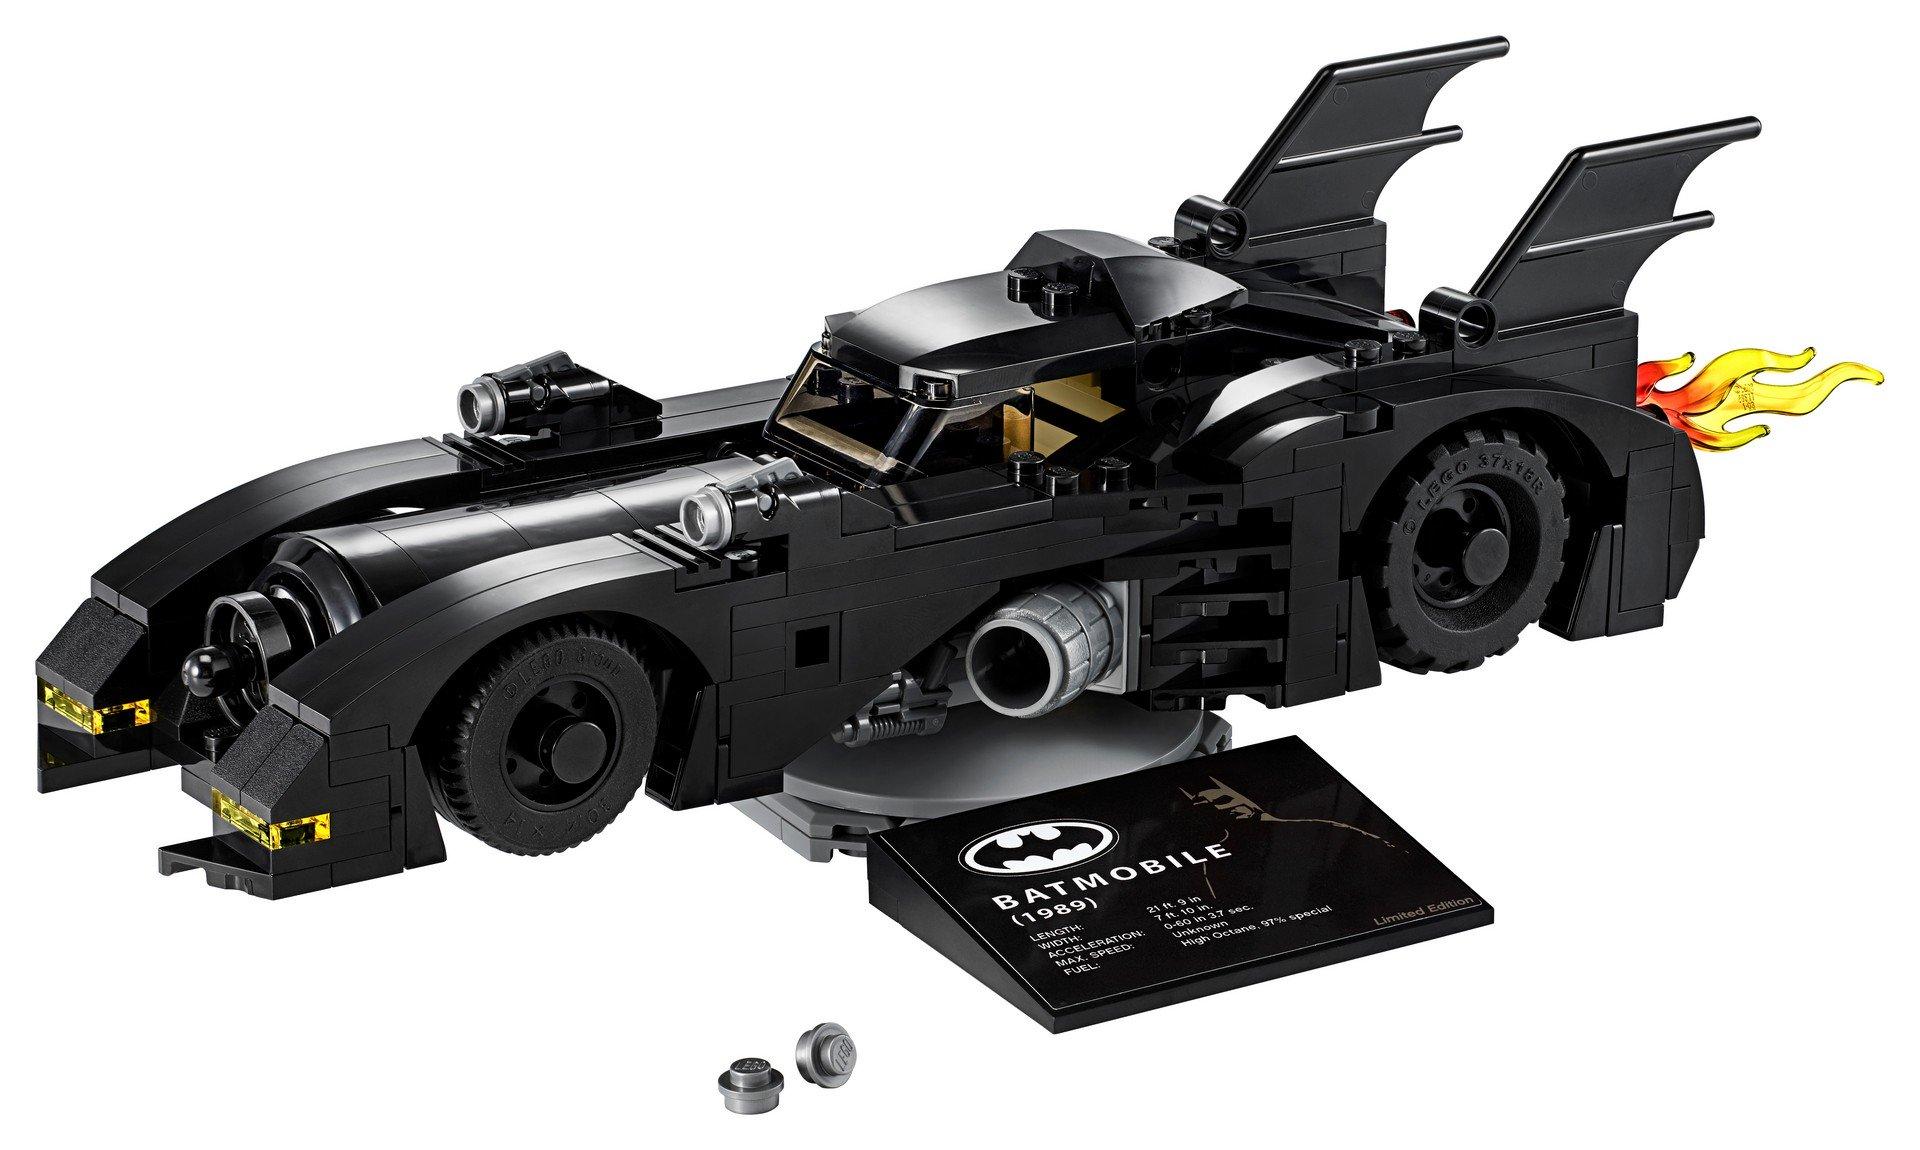 Lego-Batmobile-kit-1989-7